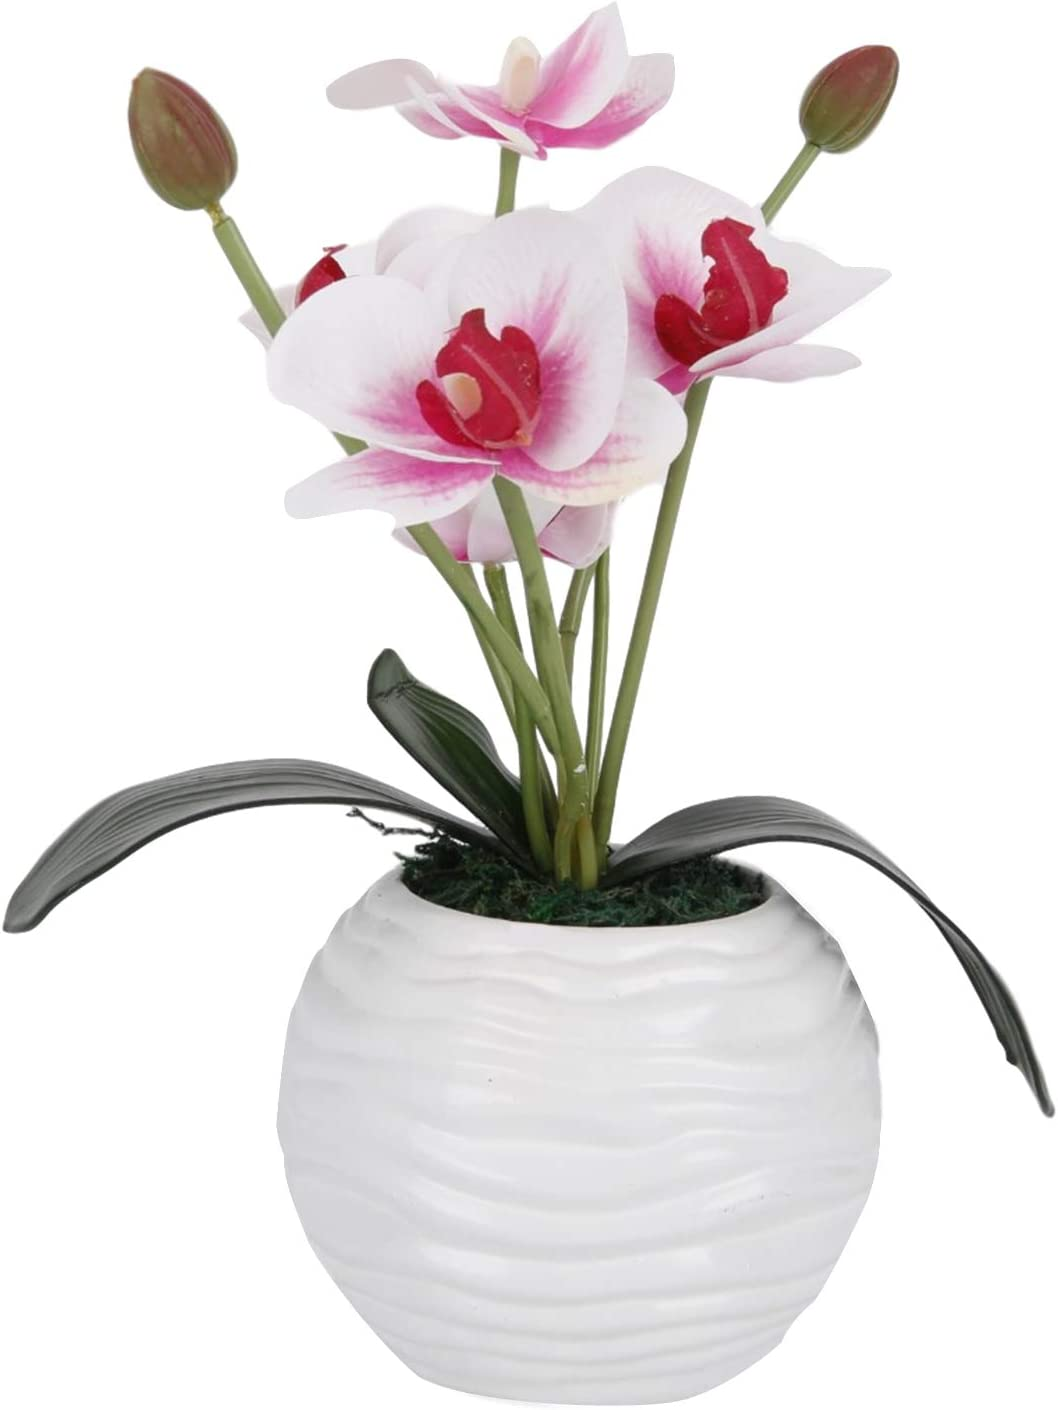 LIVILAN Artificial Flower Plant Fake Flowers Bonsai Decoration for Home Office Desk Decor Pink